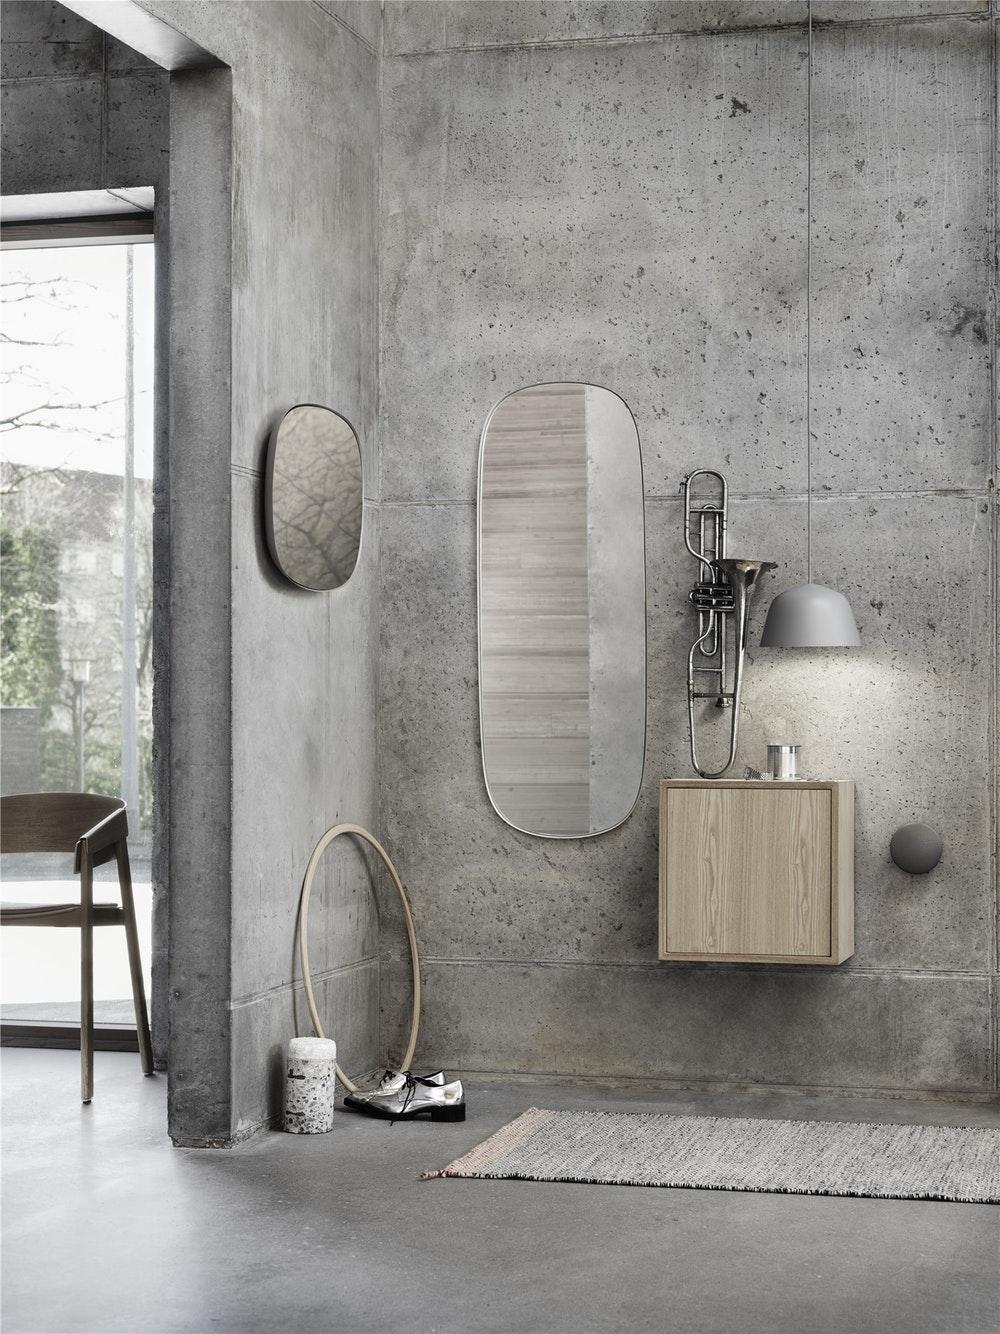 framed-mirror-hall-way-stackedwdoor-ambit-small-1460122736.jpg